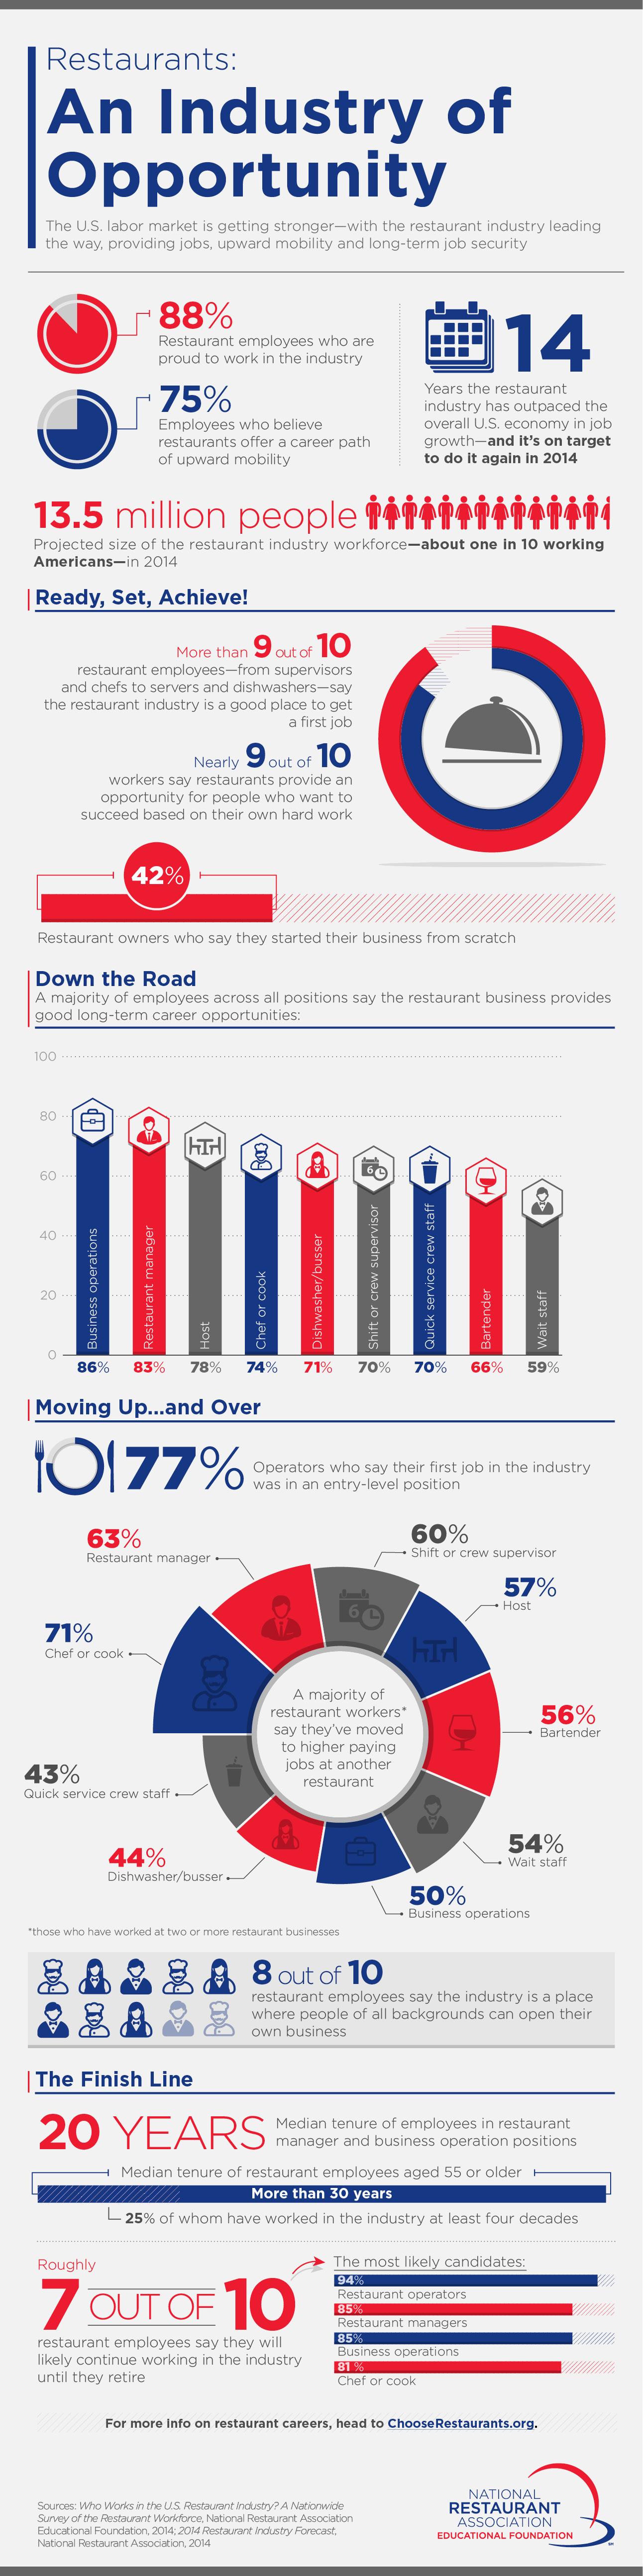 Franchising, Restaurants, Franchise, National Restaurant Association, infographic, information